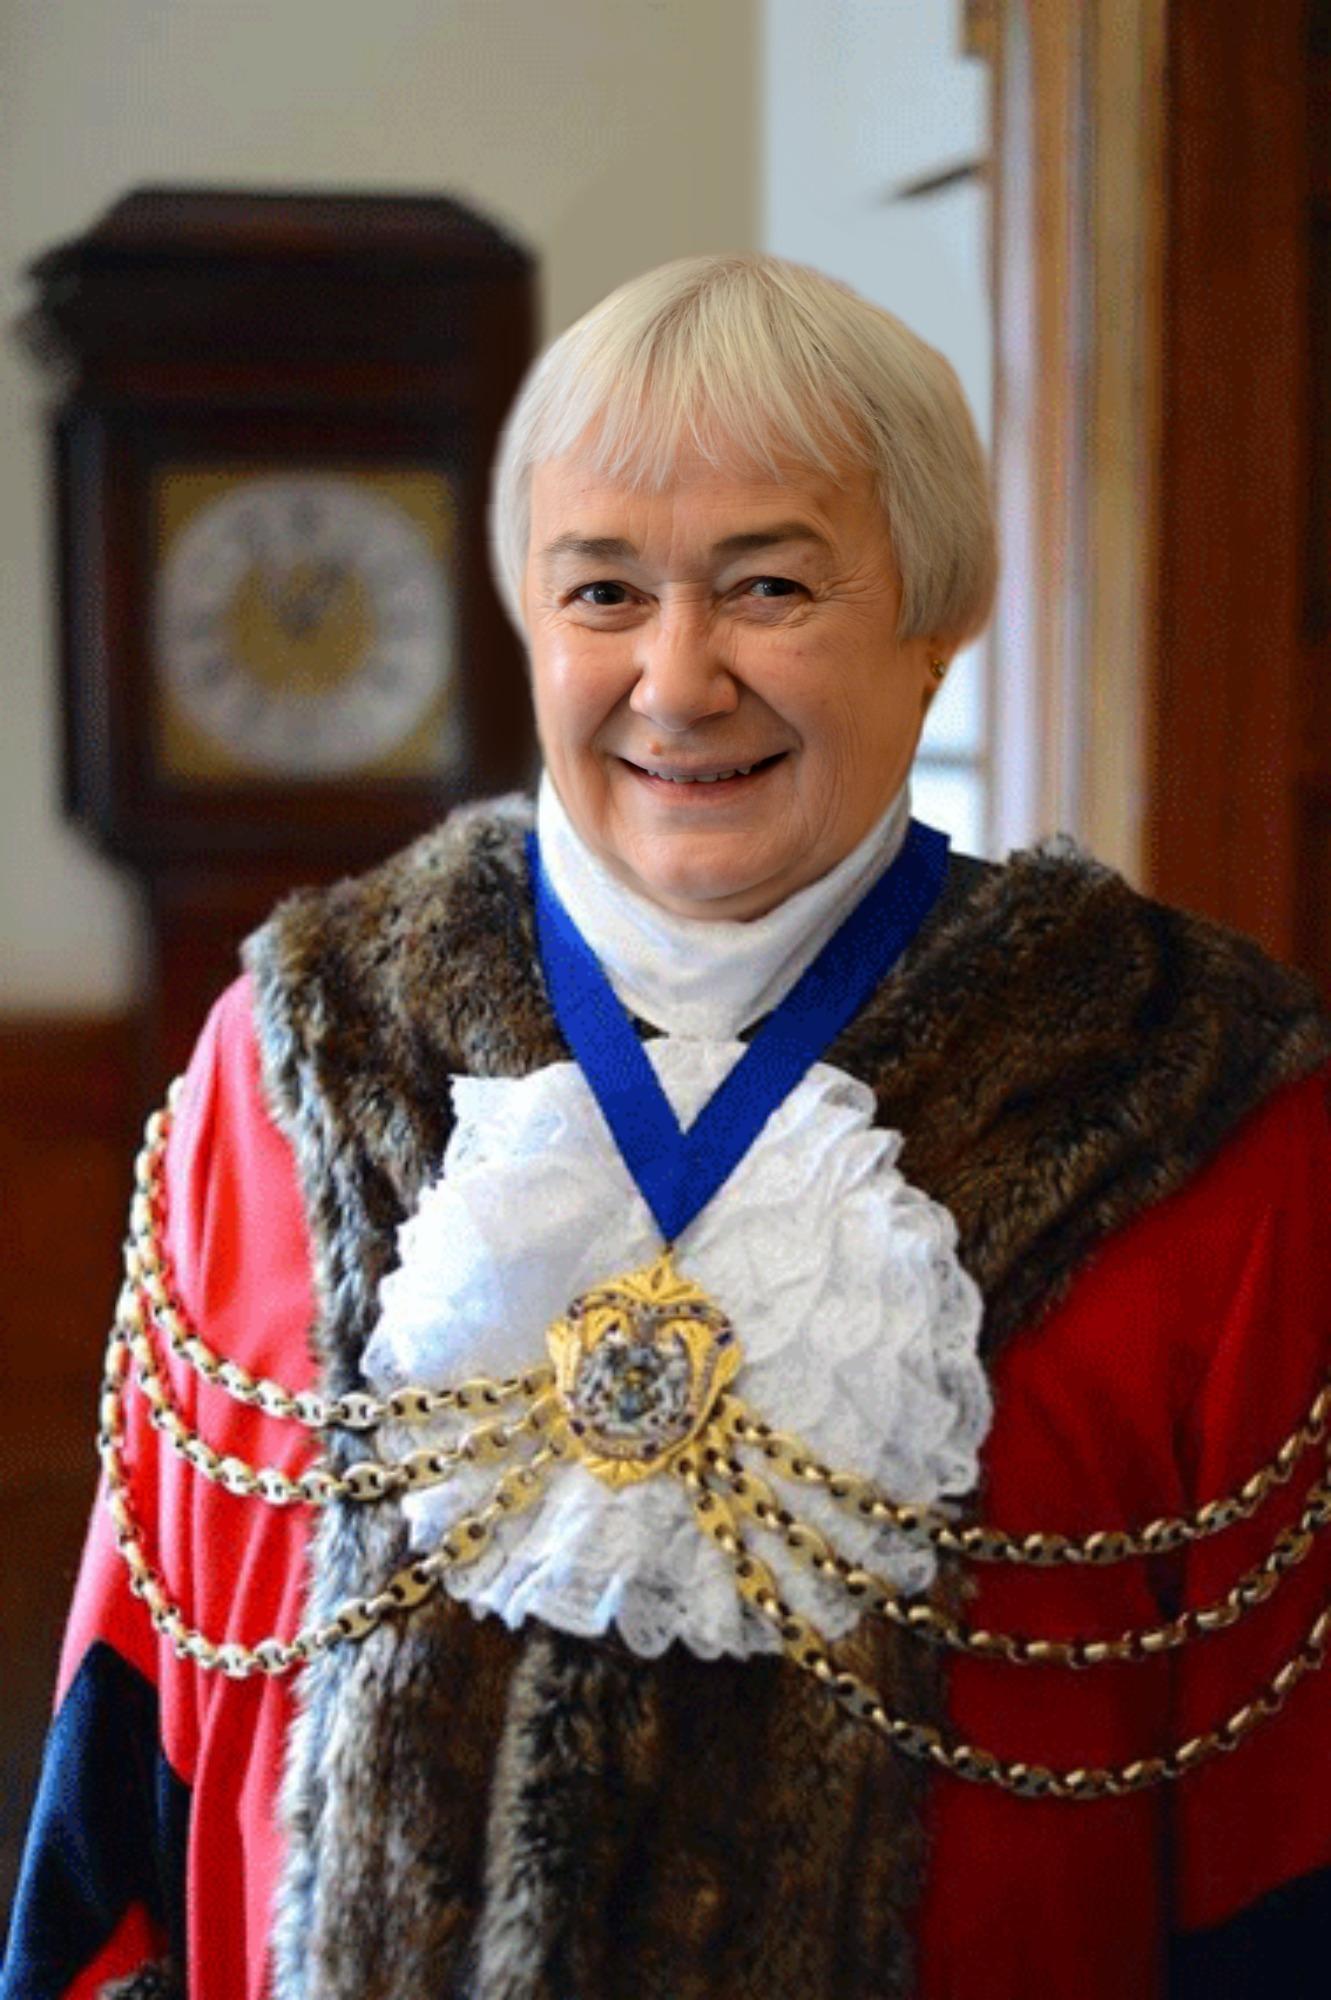 New Mayor Takes Office At Virtual Council Meeting